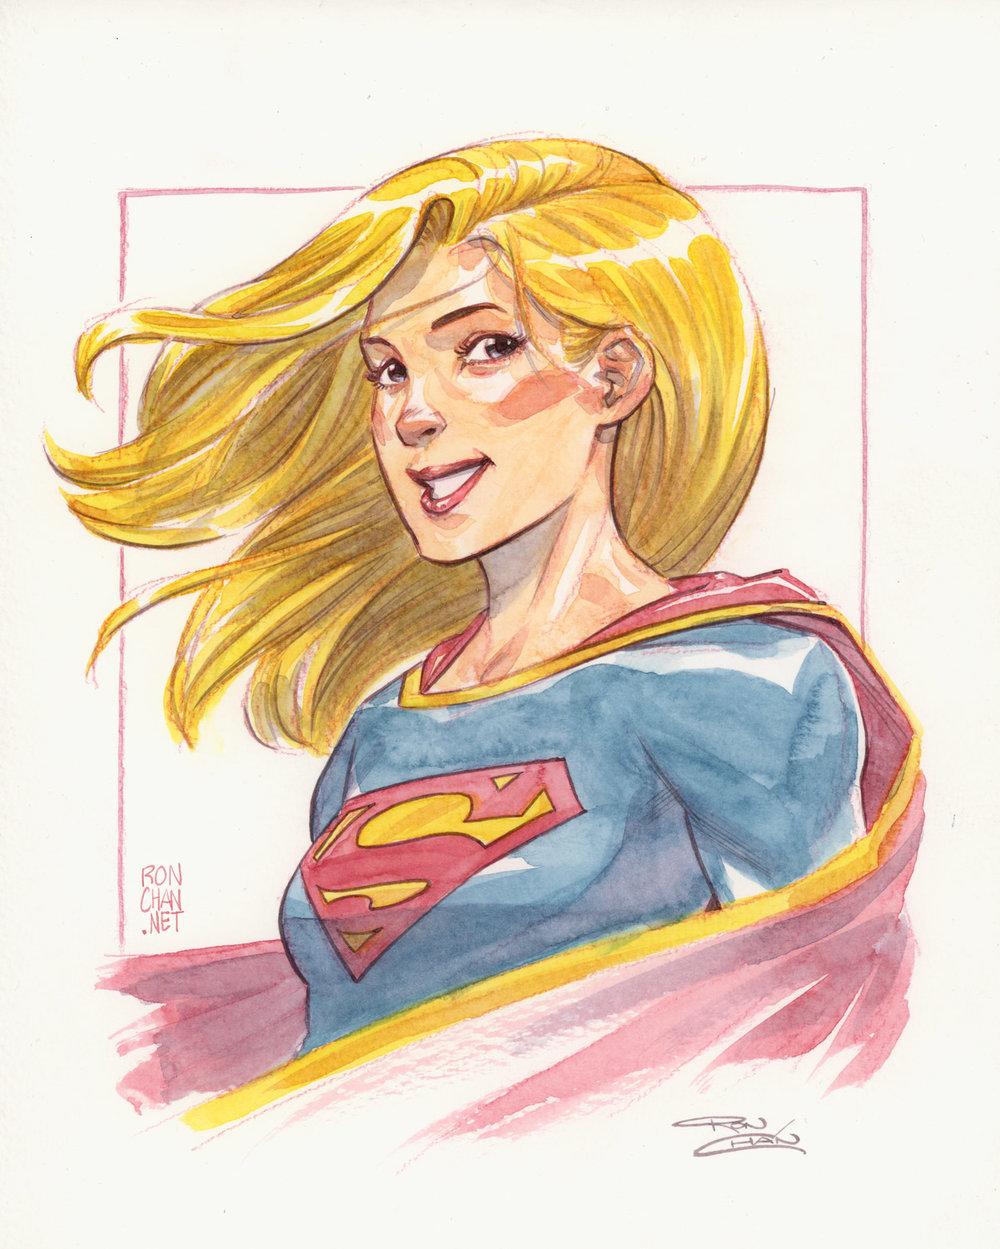 supergirl-ronchan_web.jpg